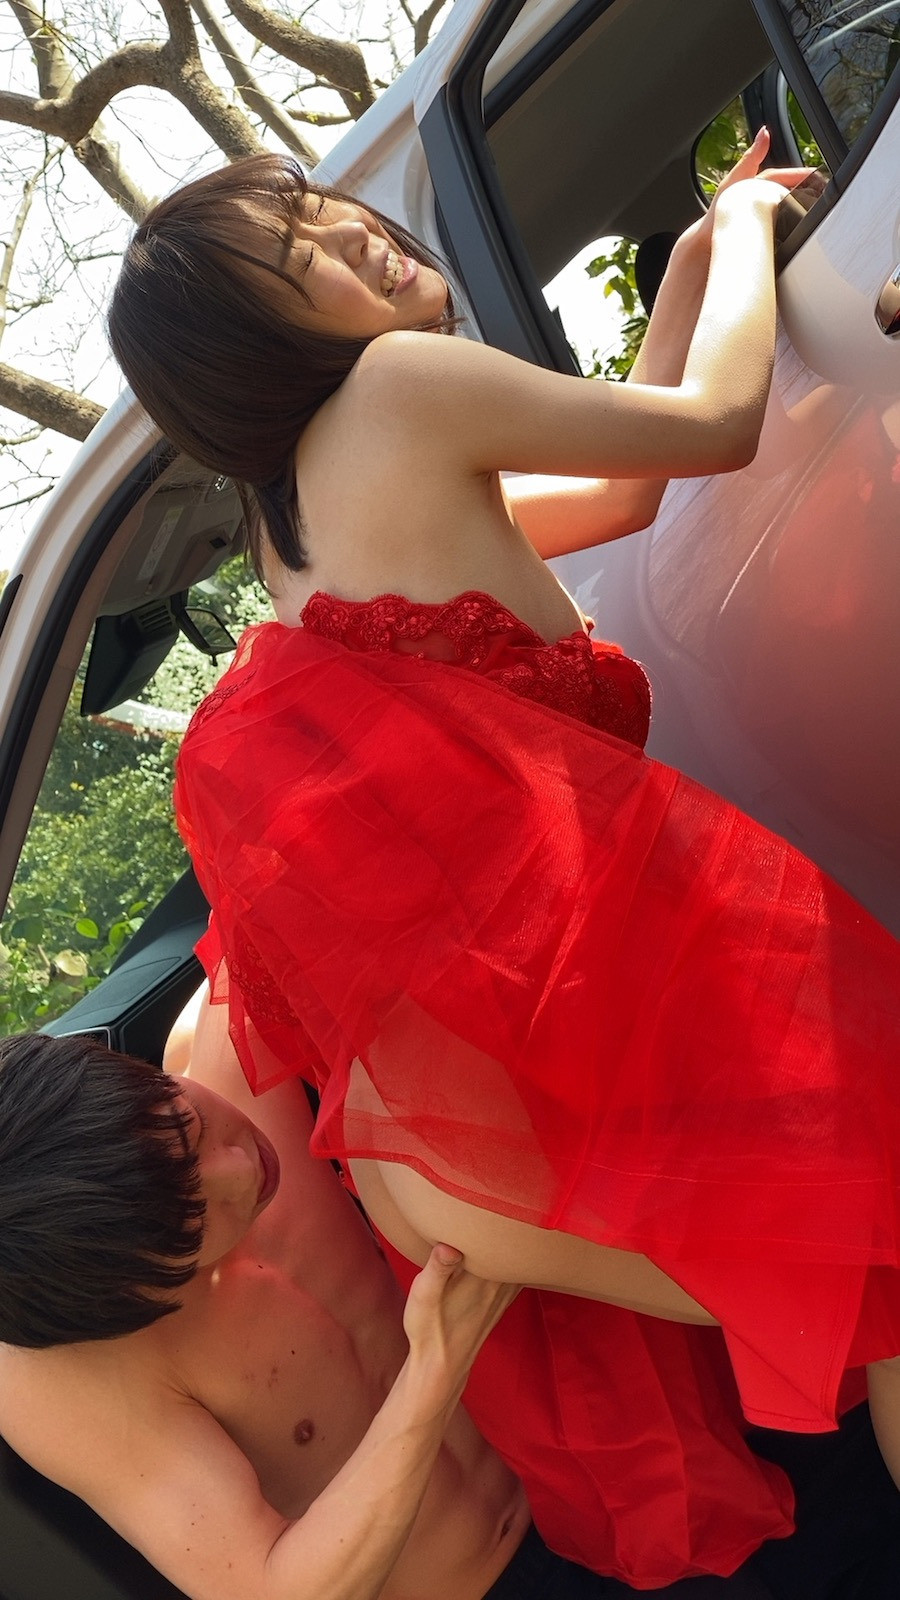 DRESS PARTY CAR SEX 渡辺まお 画像9